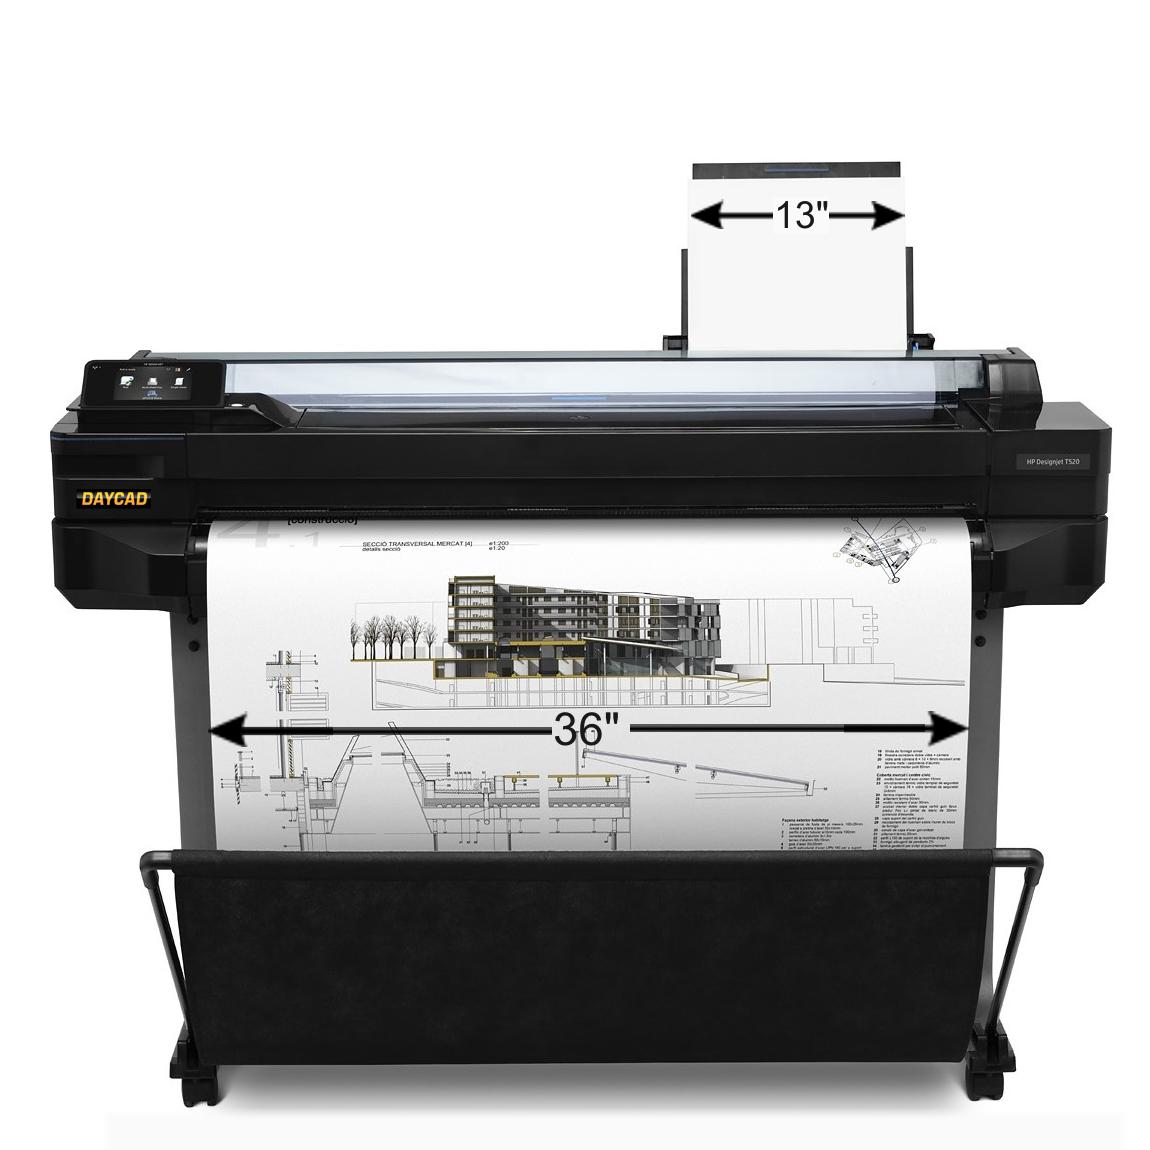 Daycad U00ae  U2013 Hp Designjet T120 T520 Printer 24 U0026quot  36 U0026quot  Cq890a Cq893c Cq891c